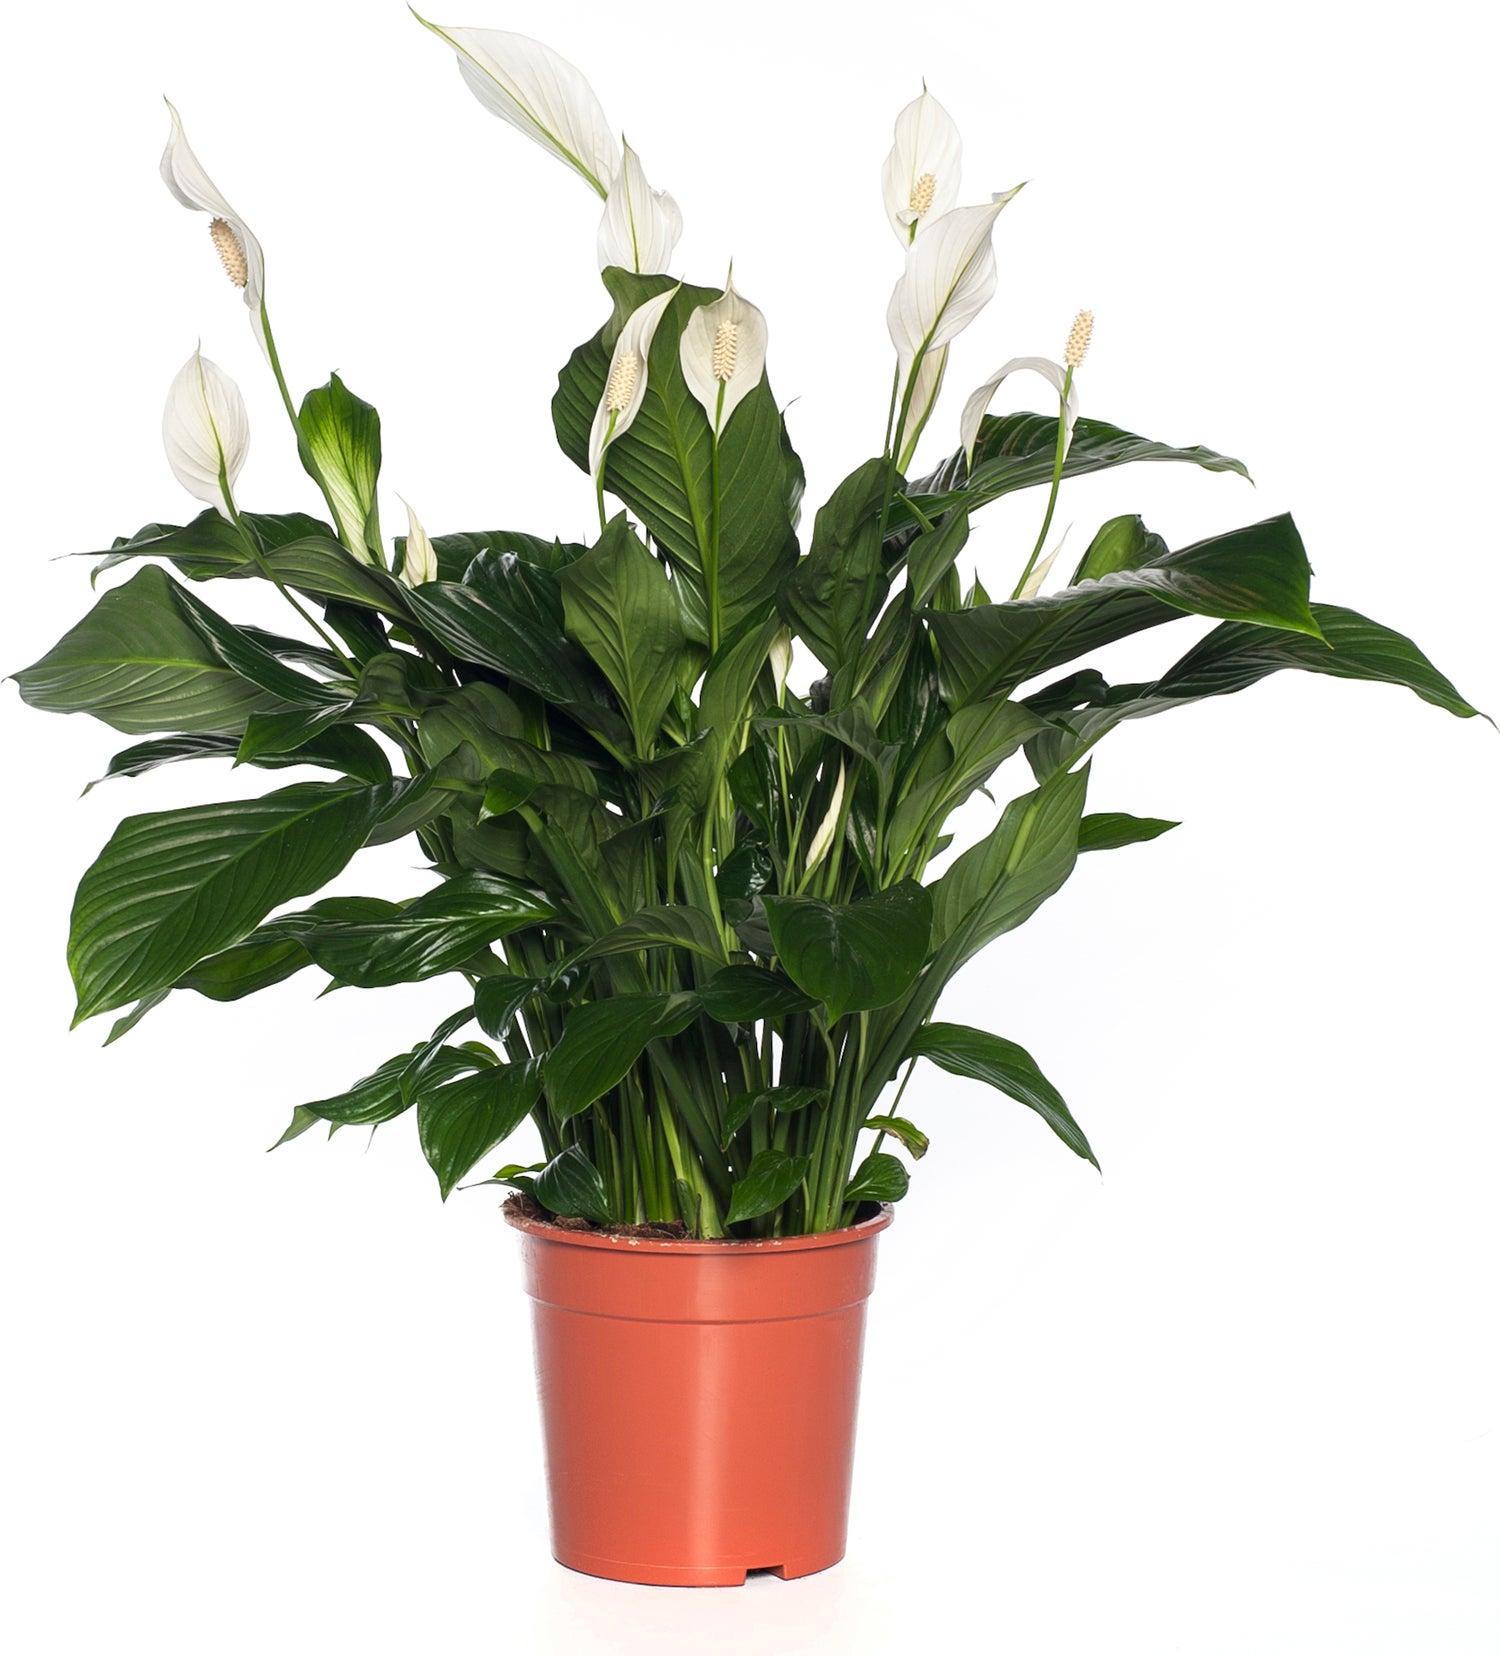 Lepelplant (Spathiphyllum 'Sweet Lauretta') D 24 H 105 cm